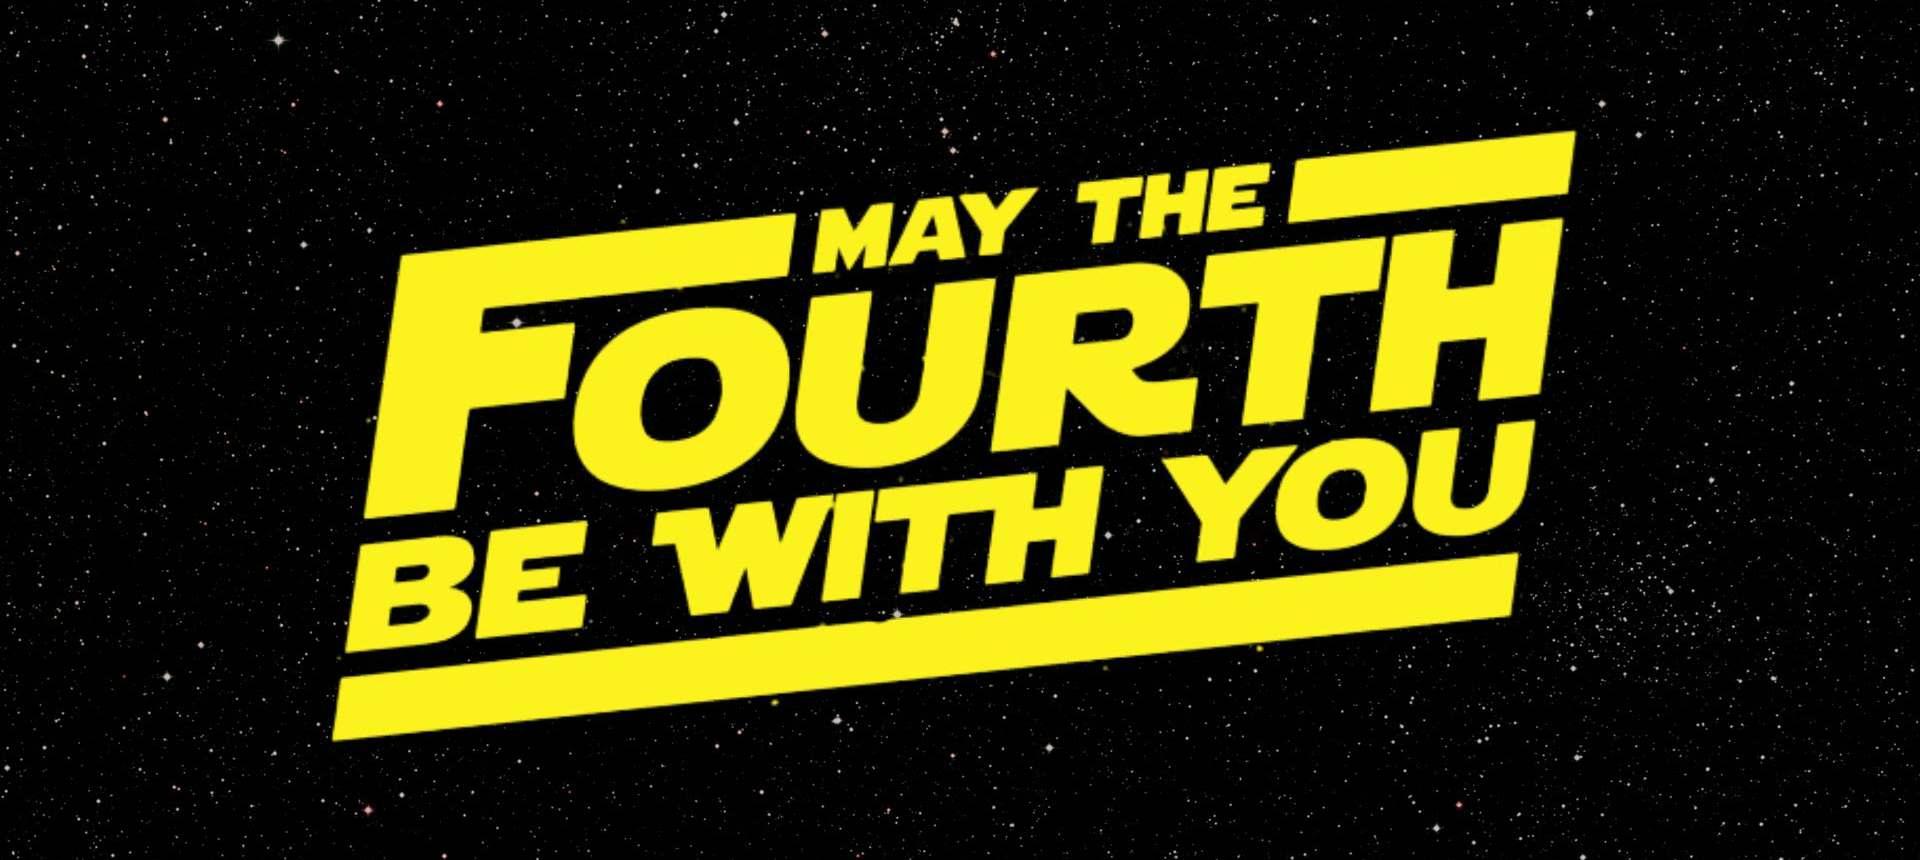 Data comemora a franquia Star Wars